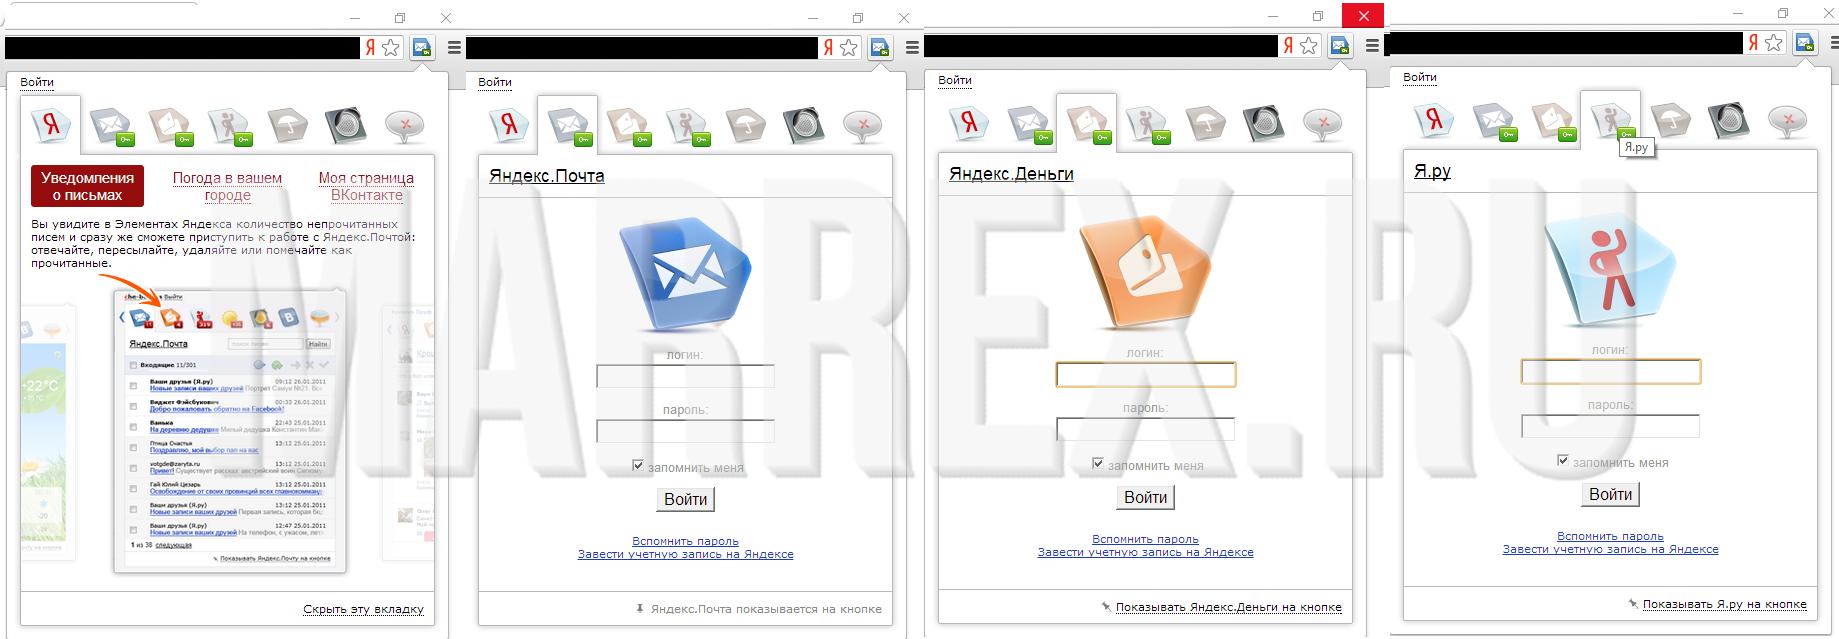 Google Chrome 15 rus (Yandex версия)